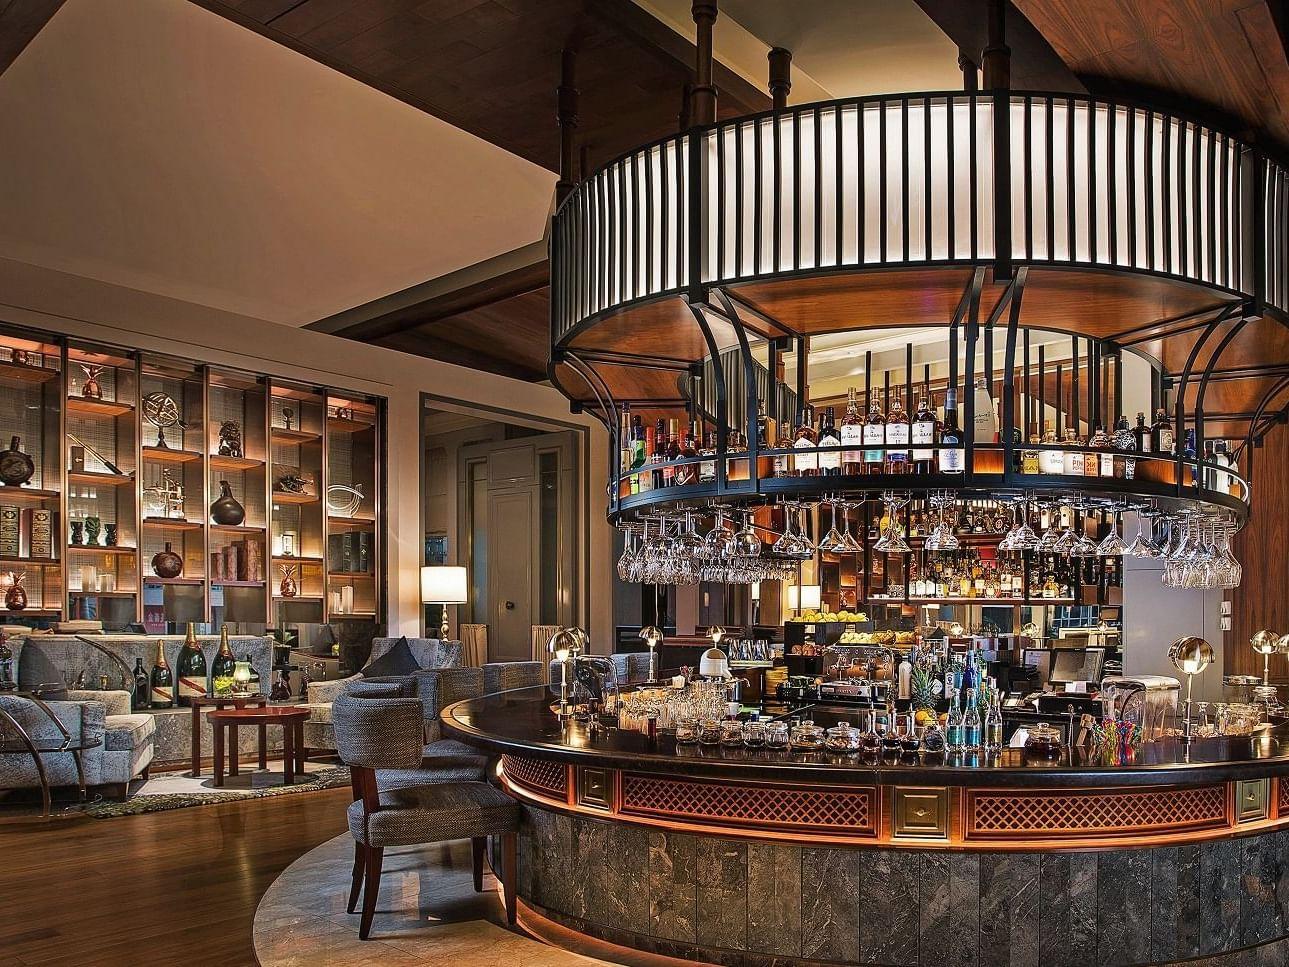 Vasco bar and lounge at Artyzen Grand Lapa Hotel Macau